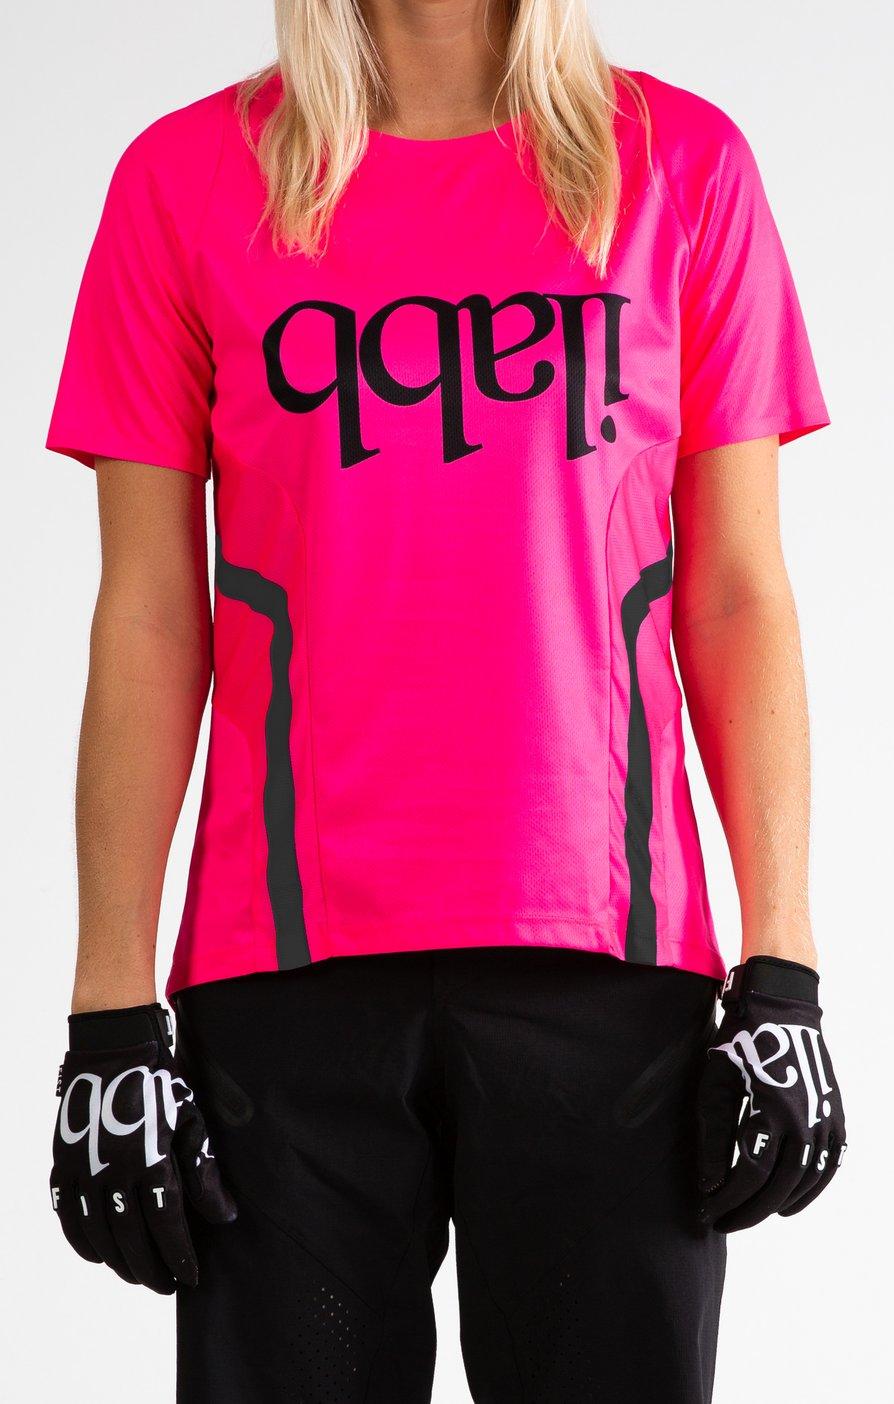 Don Race Tee Womens - Neon Pink ライドシャツ